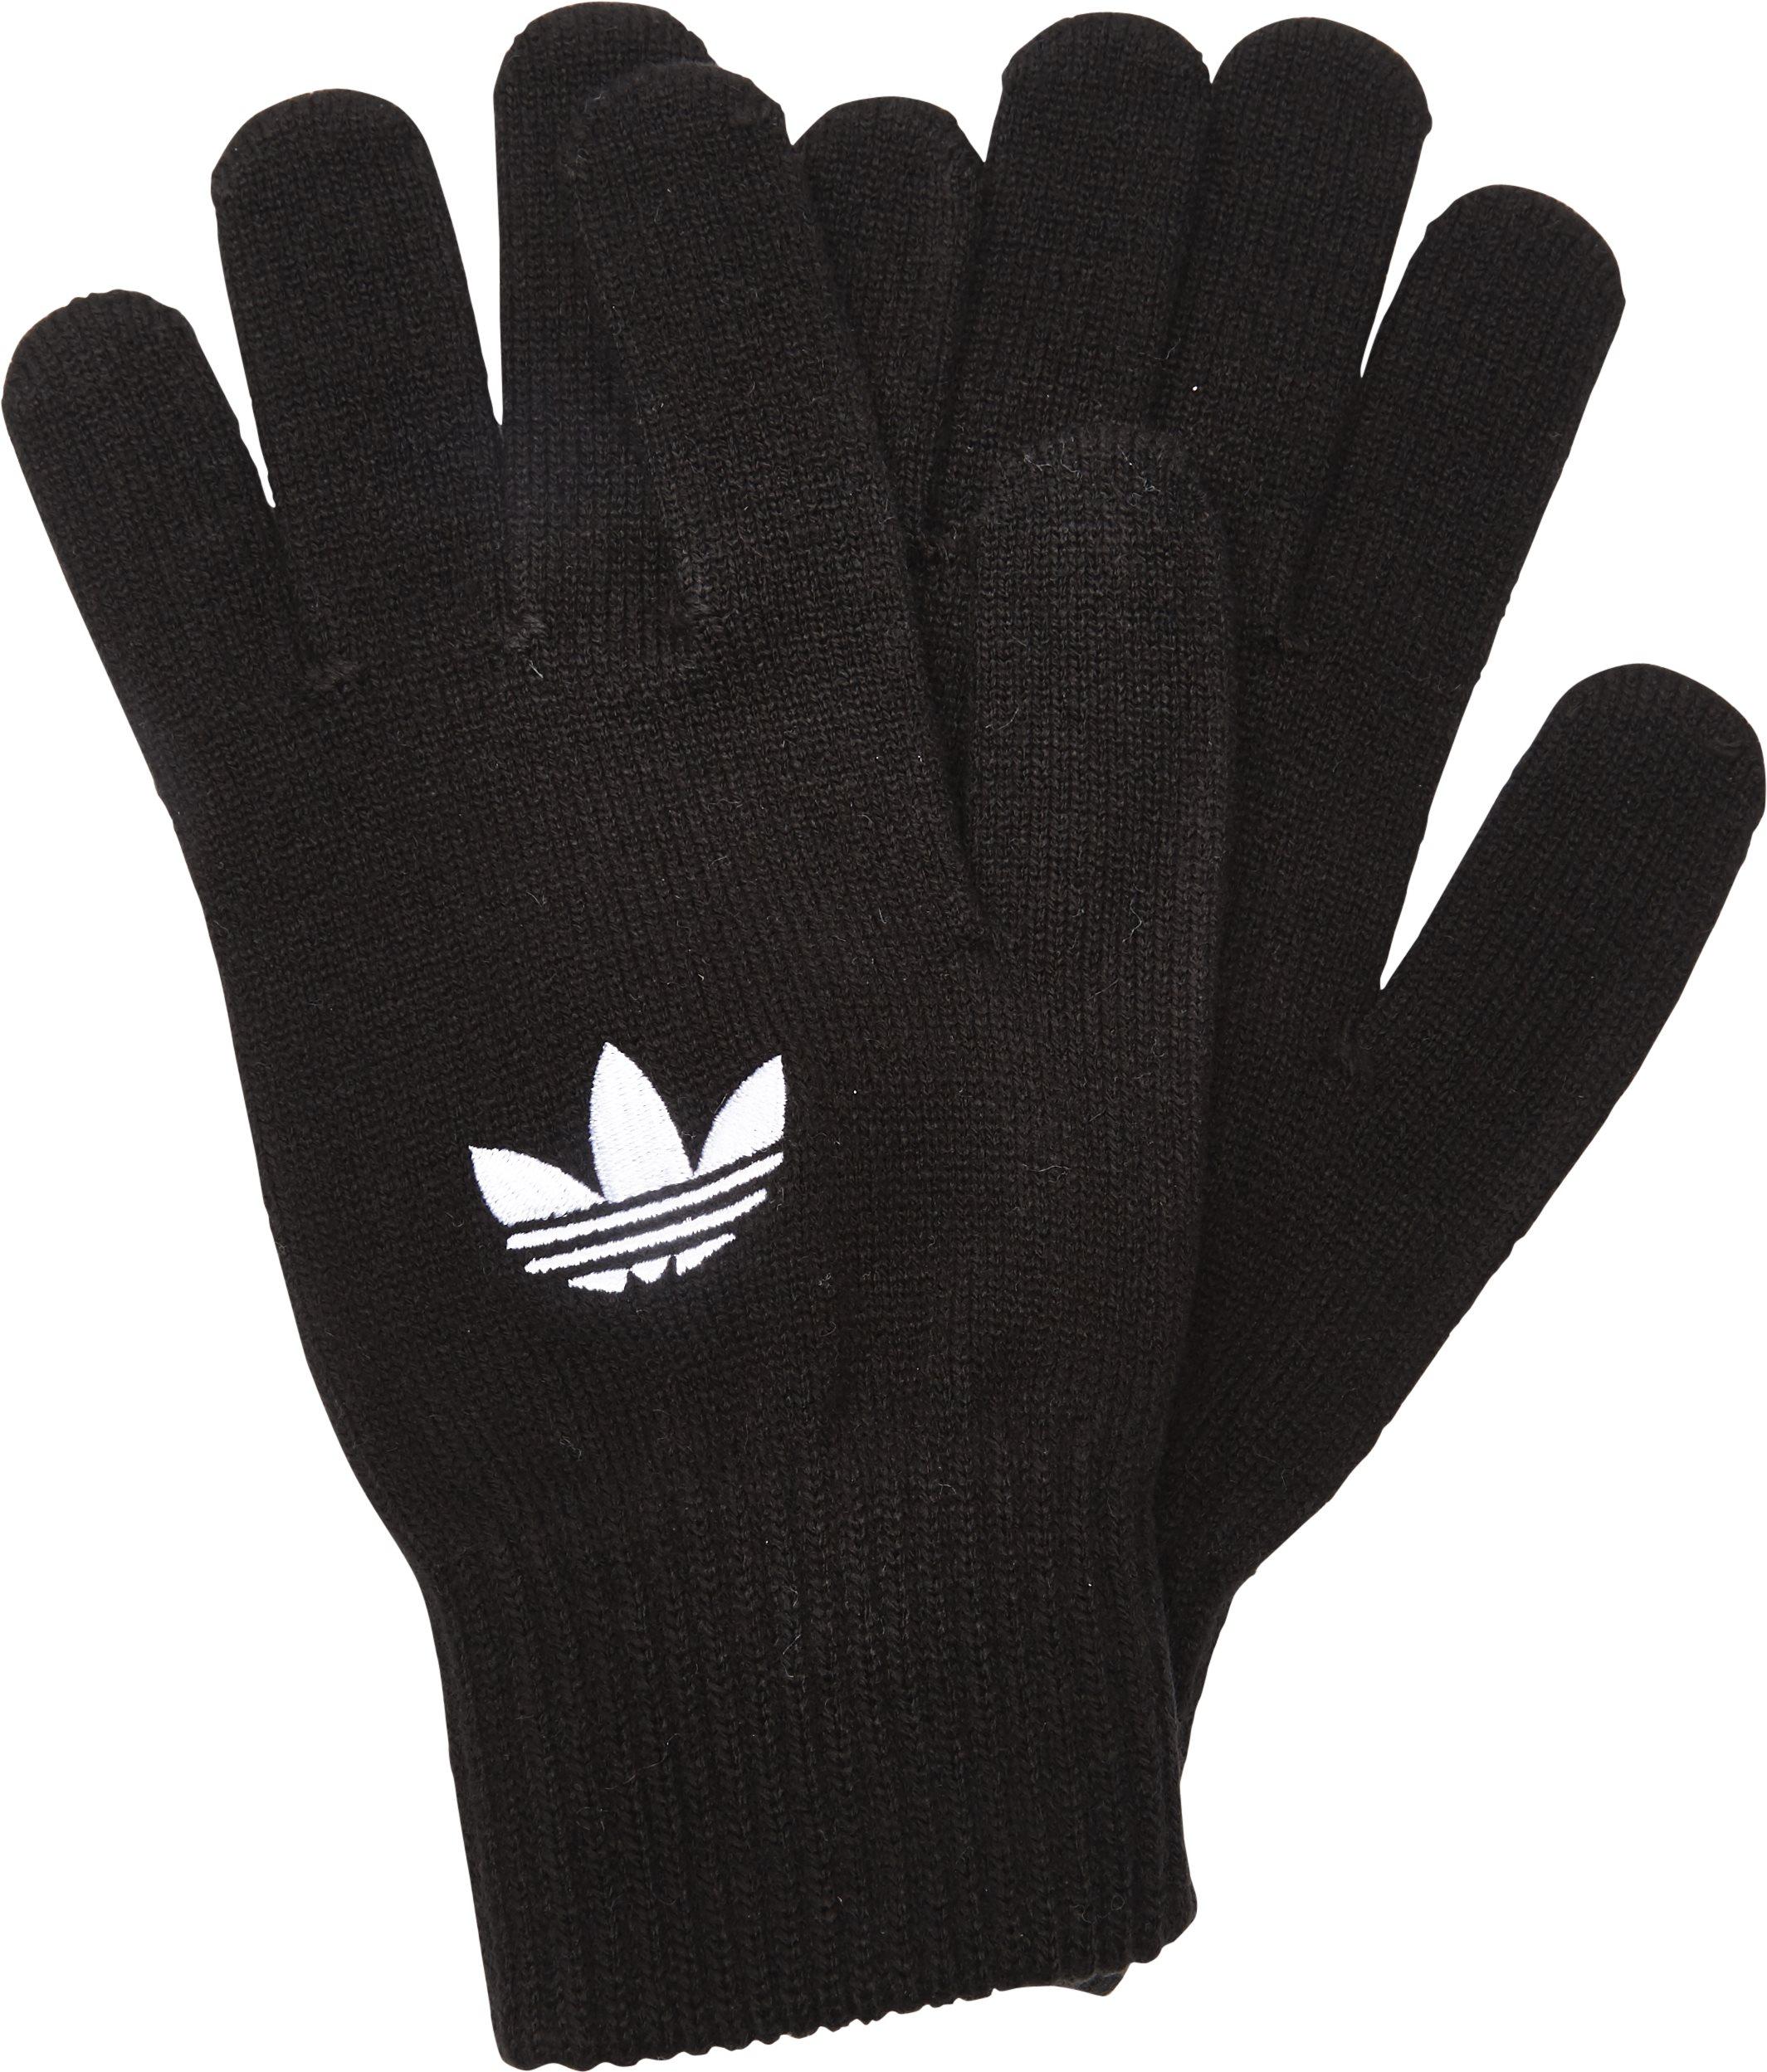 Corte café Absorber  TREFOIL GLOVES AY933 Gloves SORT from Adidas Originals 23 EUR